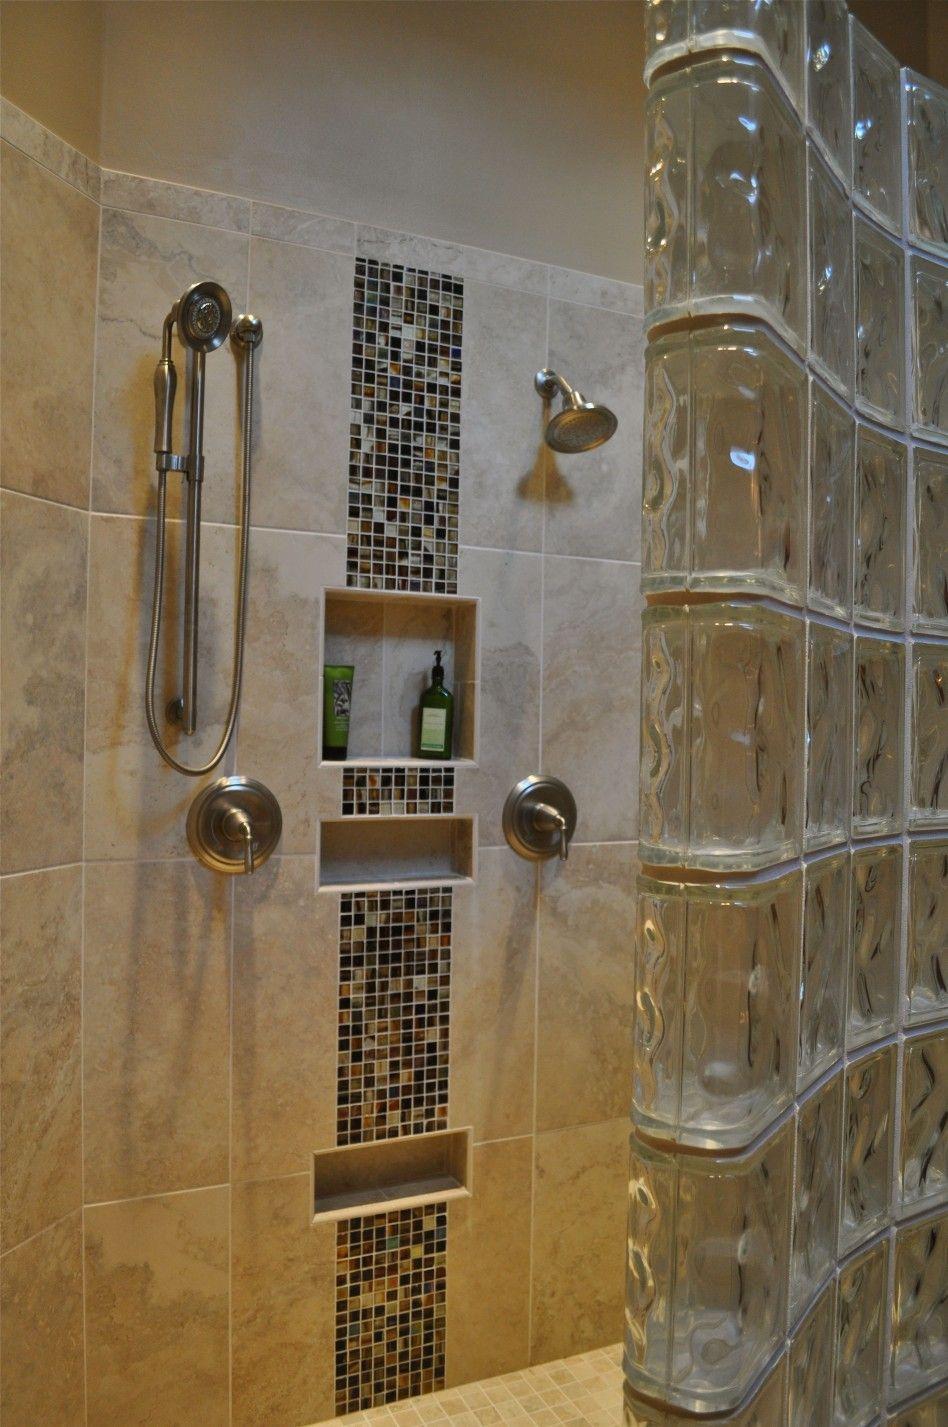 Mosaic Tile Shower | ... Walk In Shower And Ceramic Mosaic Tile ...